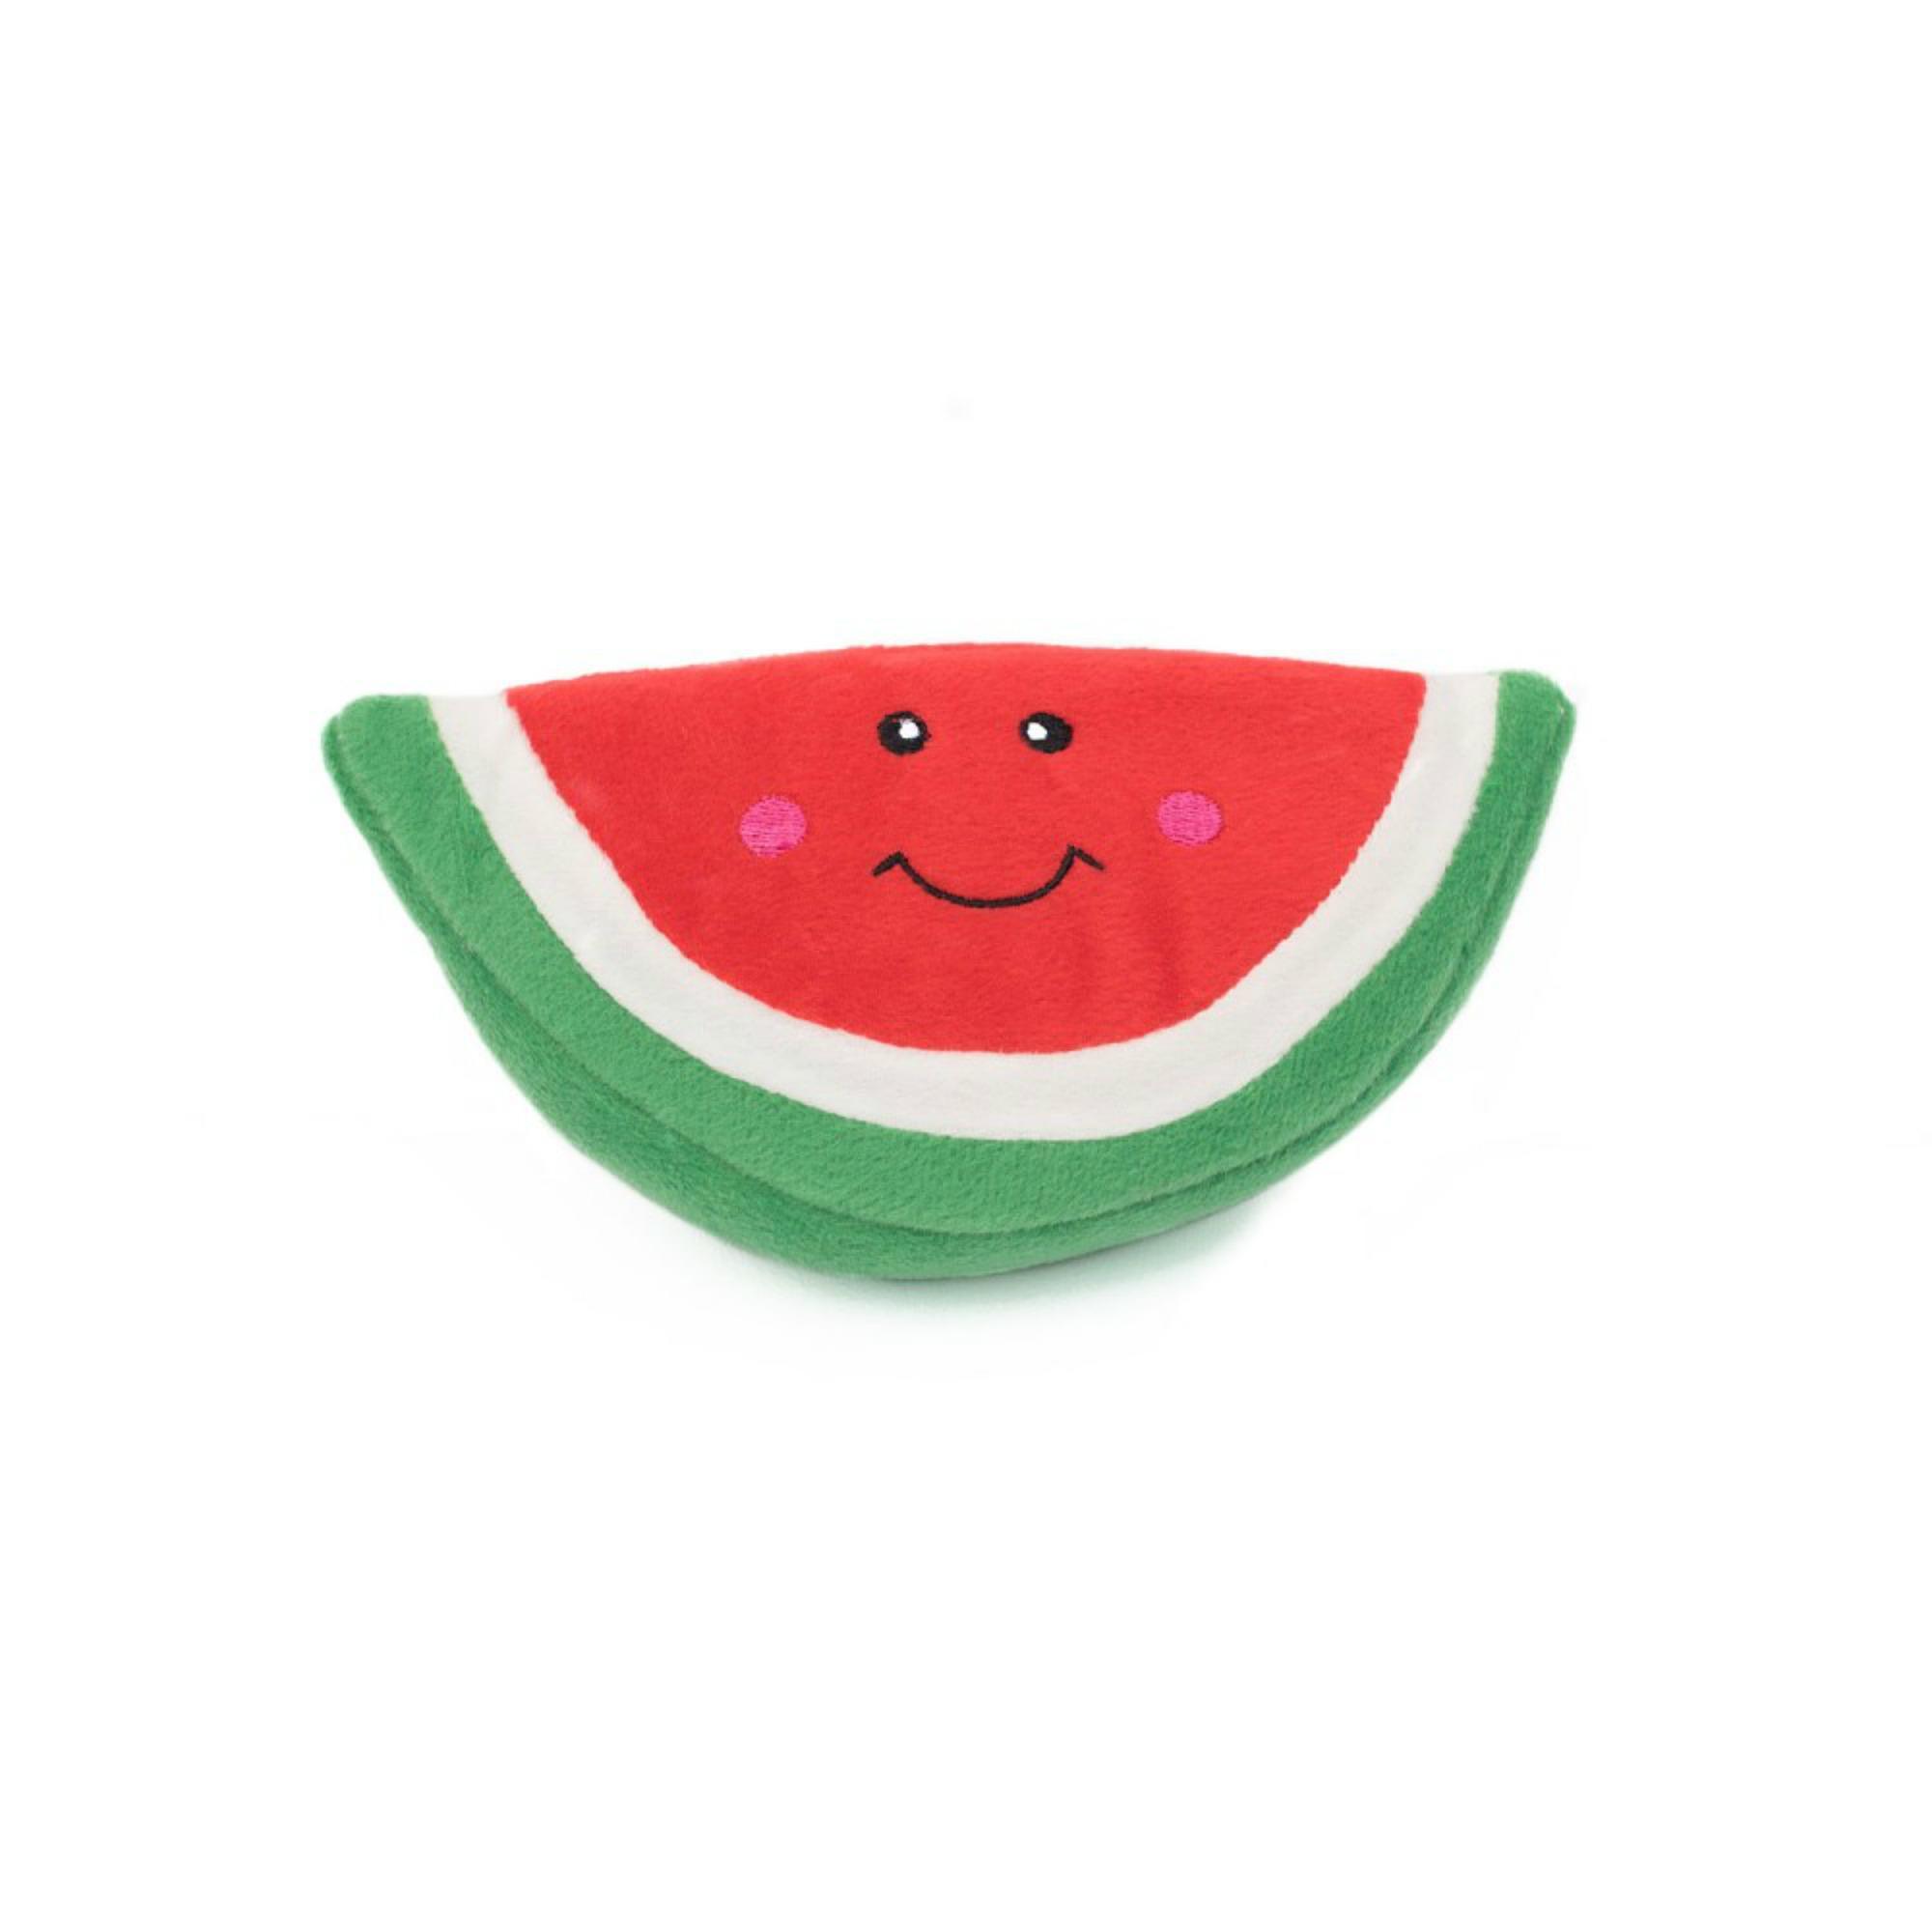 ZippyPaws NomNomz Dog Toy - Watermelon